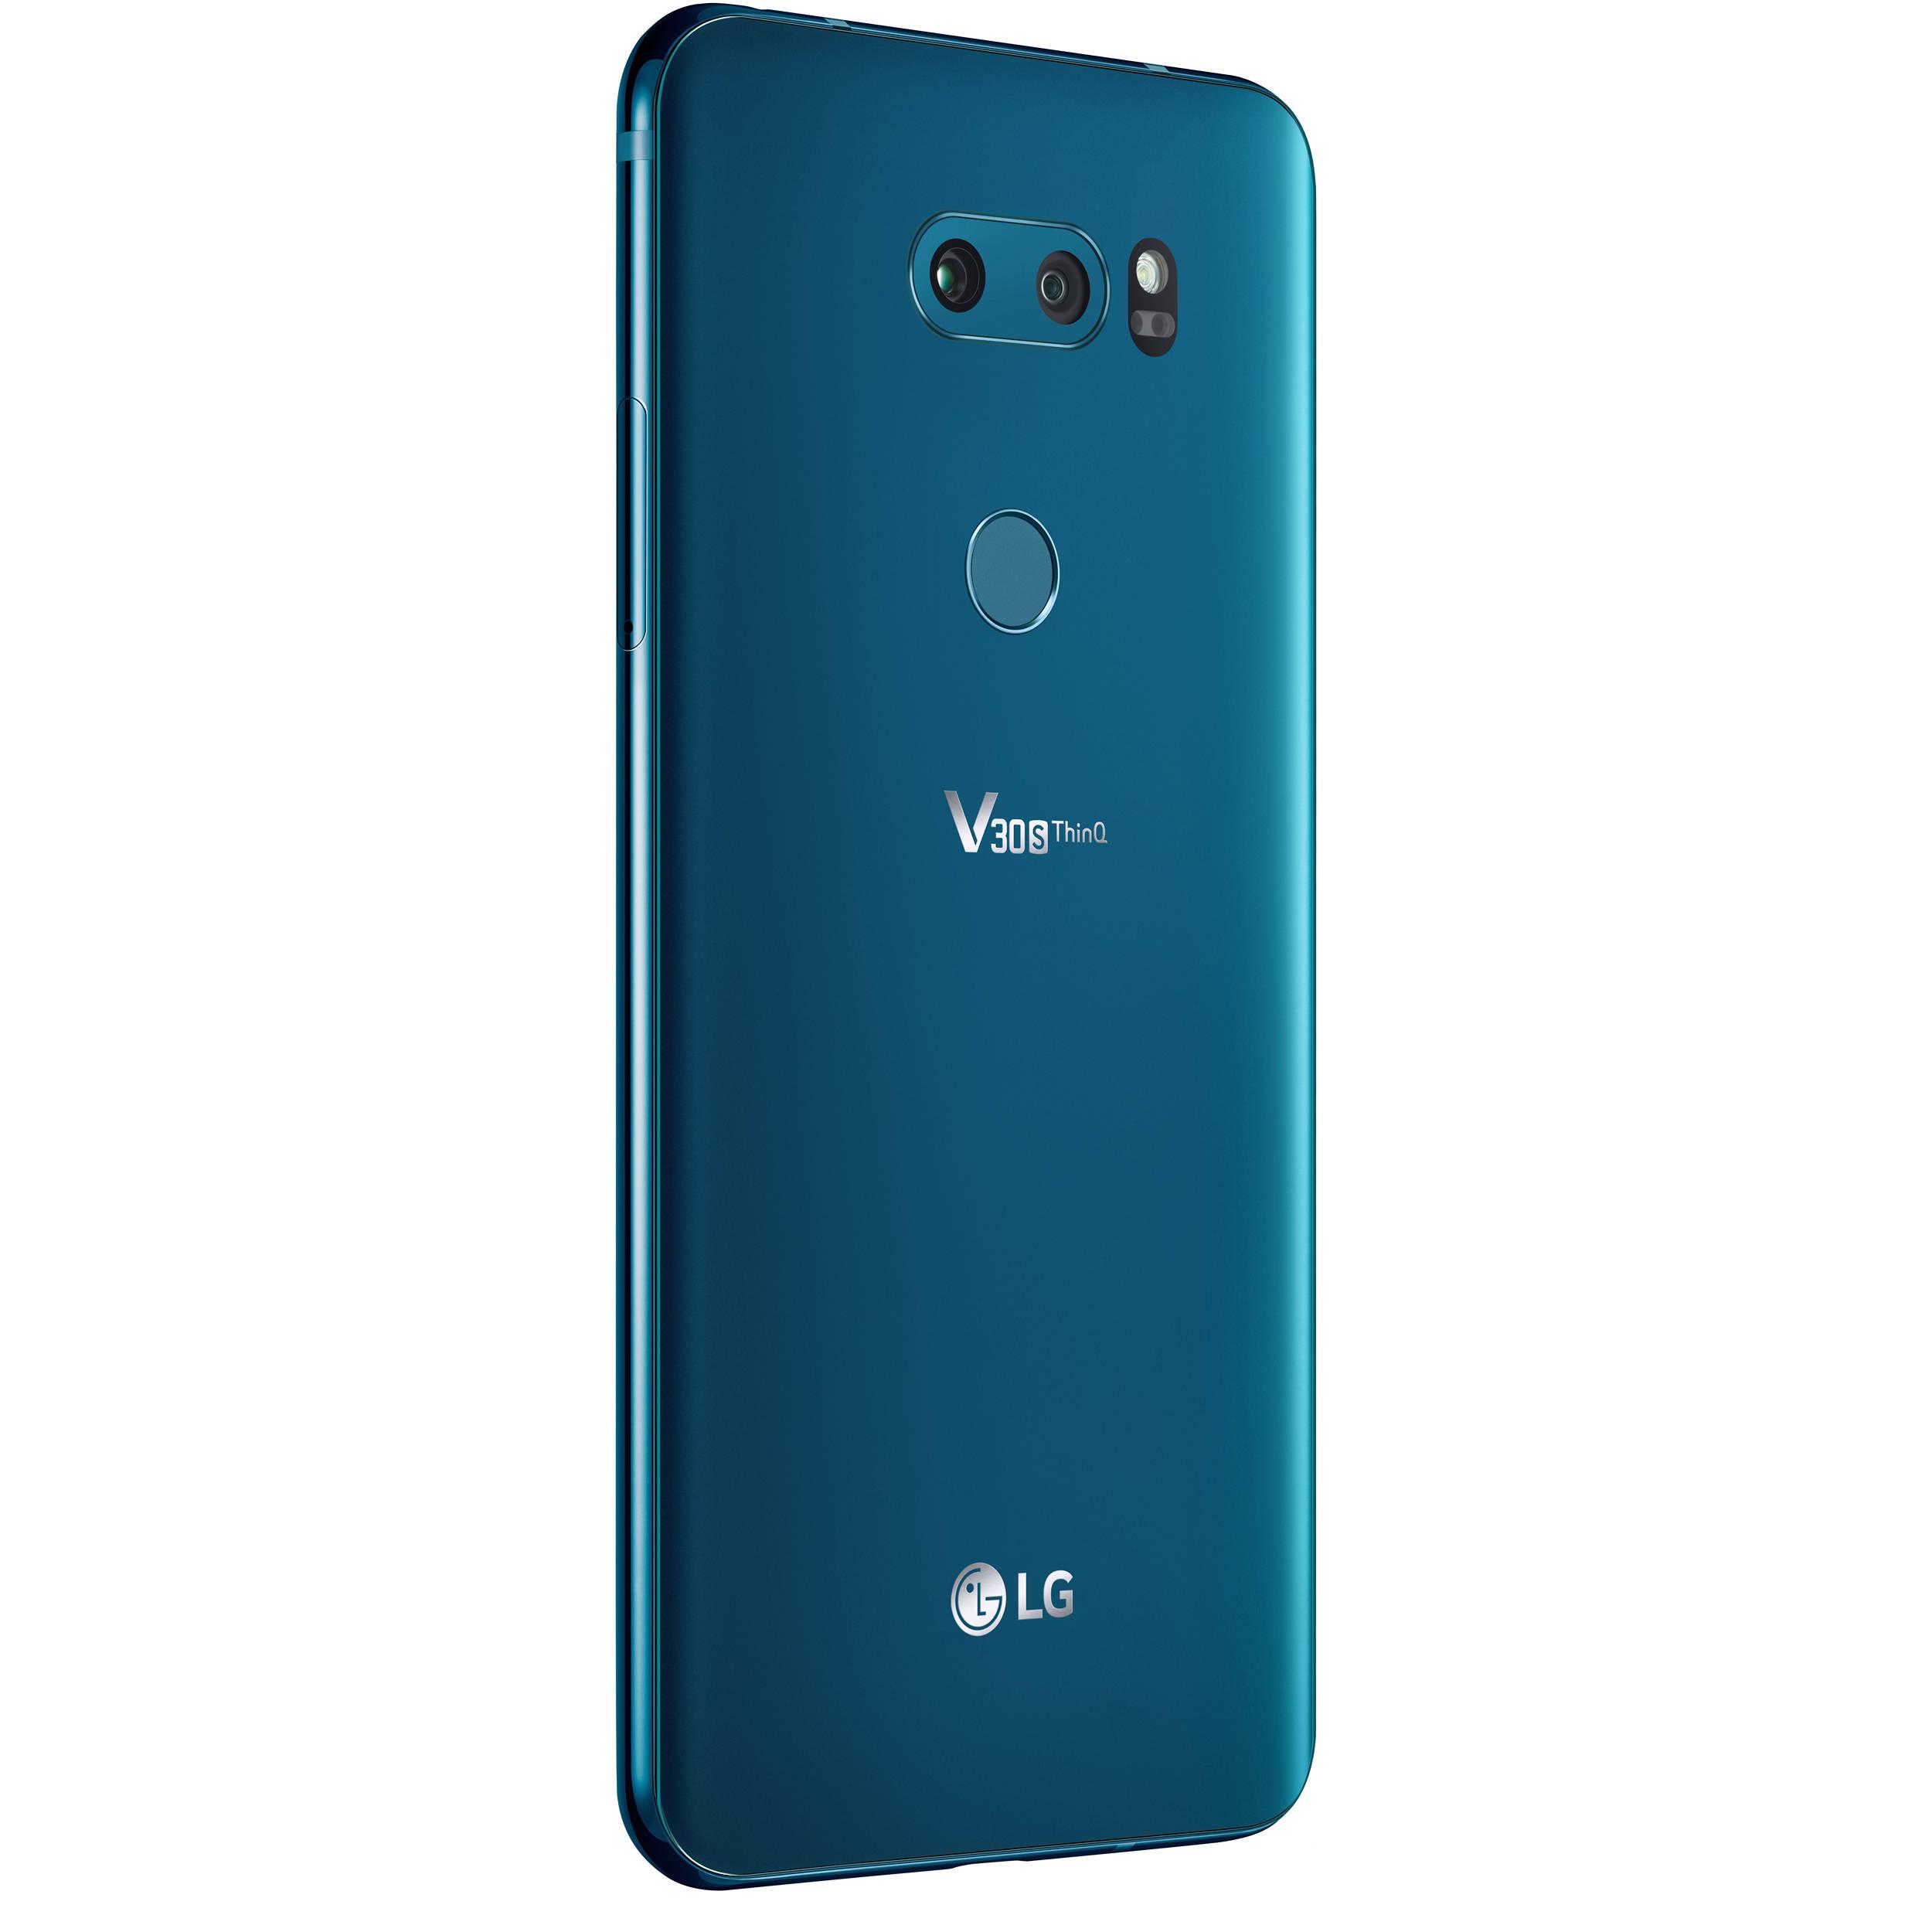 LG V30S ThinQ 128GB Smartphone (Unlocked, Glossy Moroccan Blue)